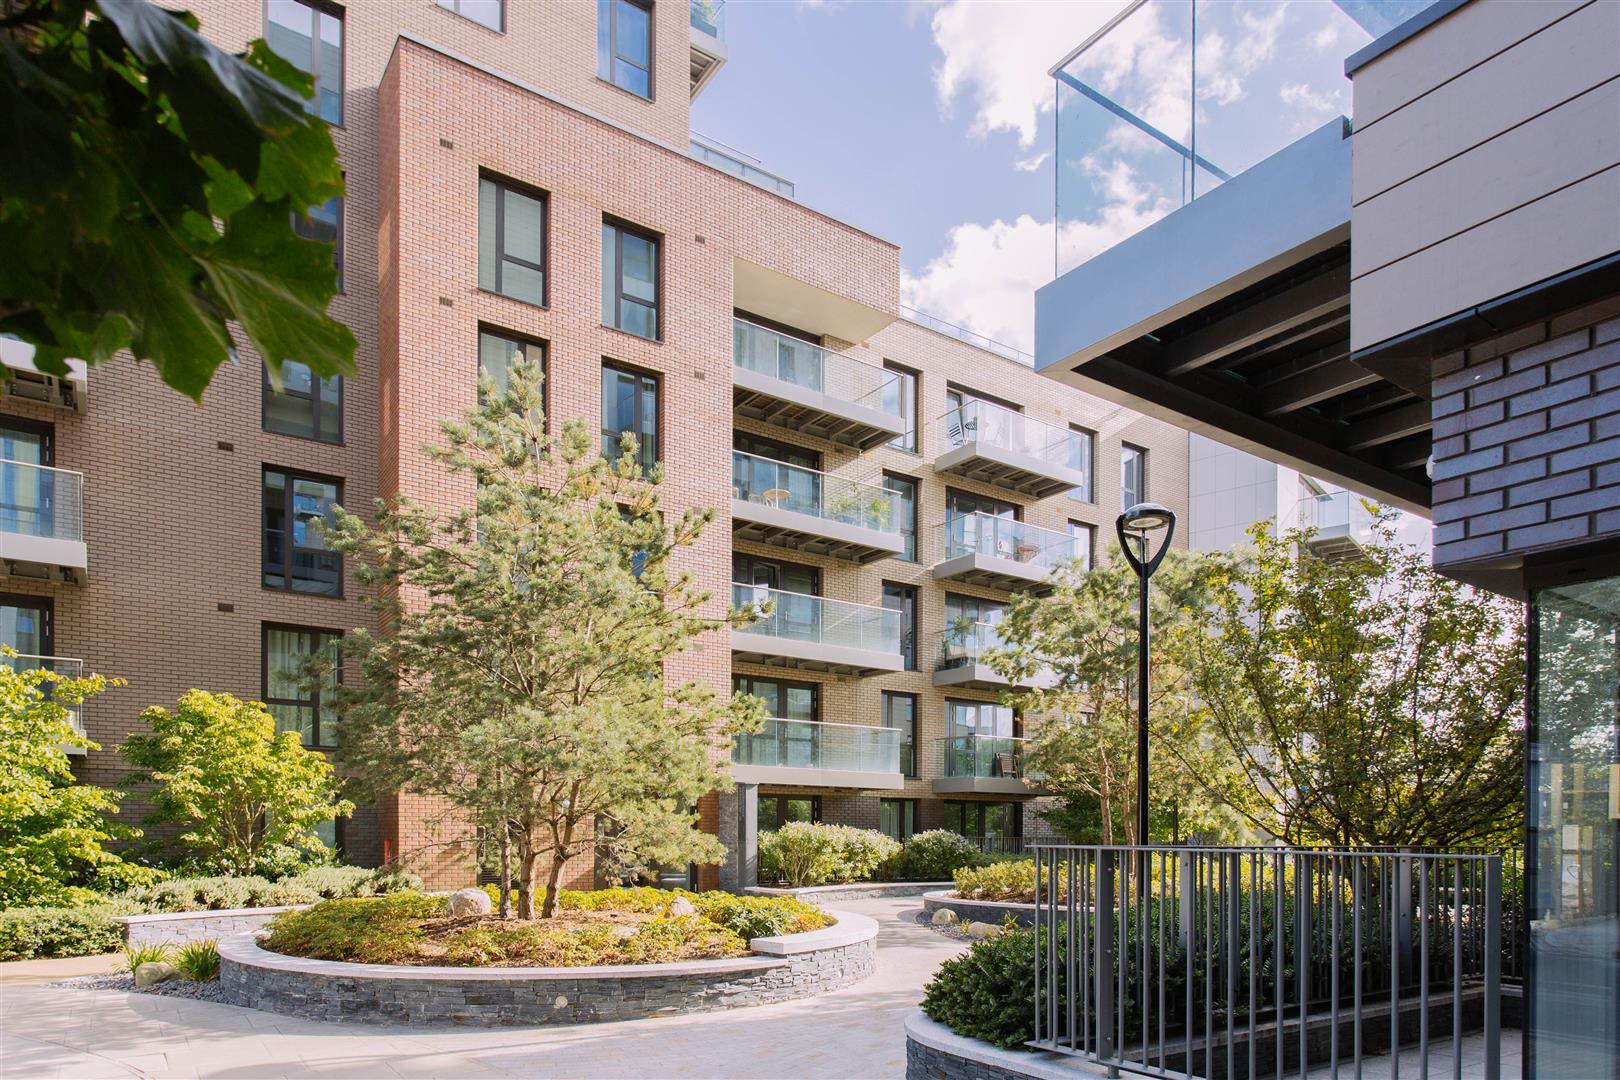 MB_rivulet apartments_manor house_davies davies_40